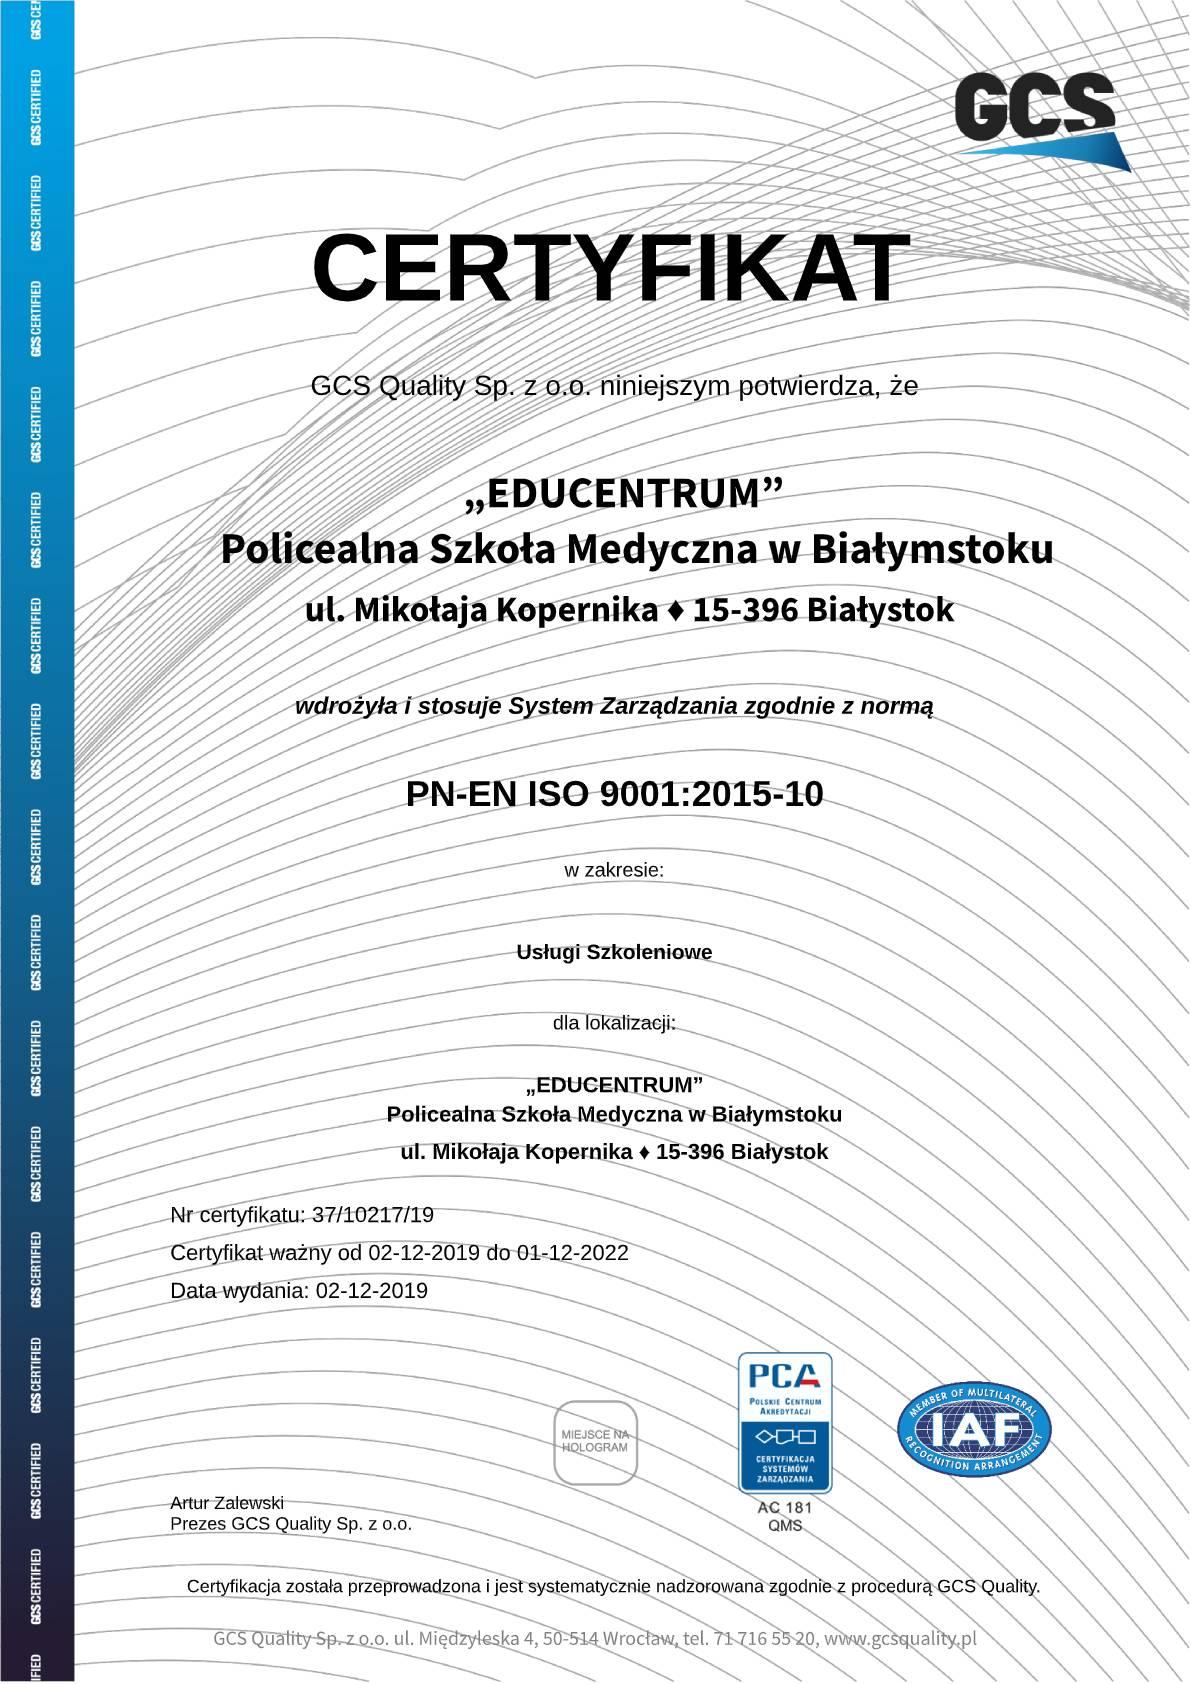 217_CERTYFIKAT gcs - wzor ver-pdf